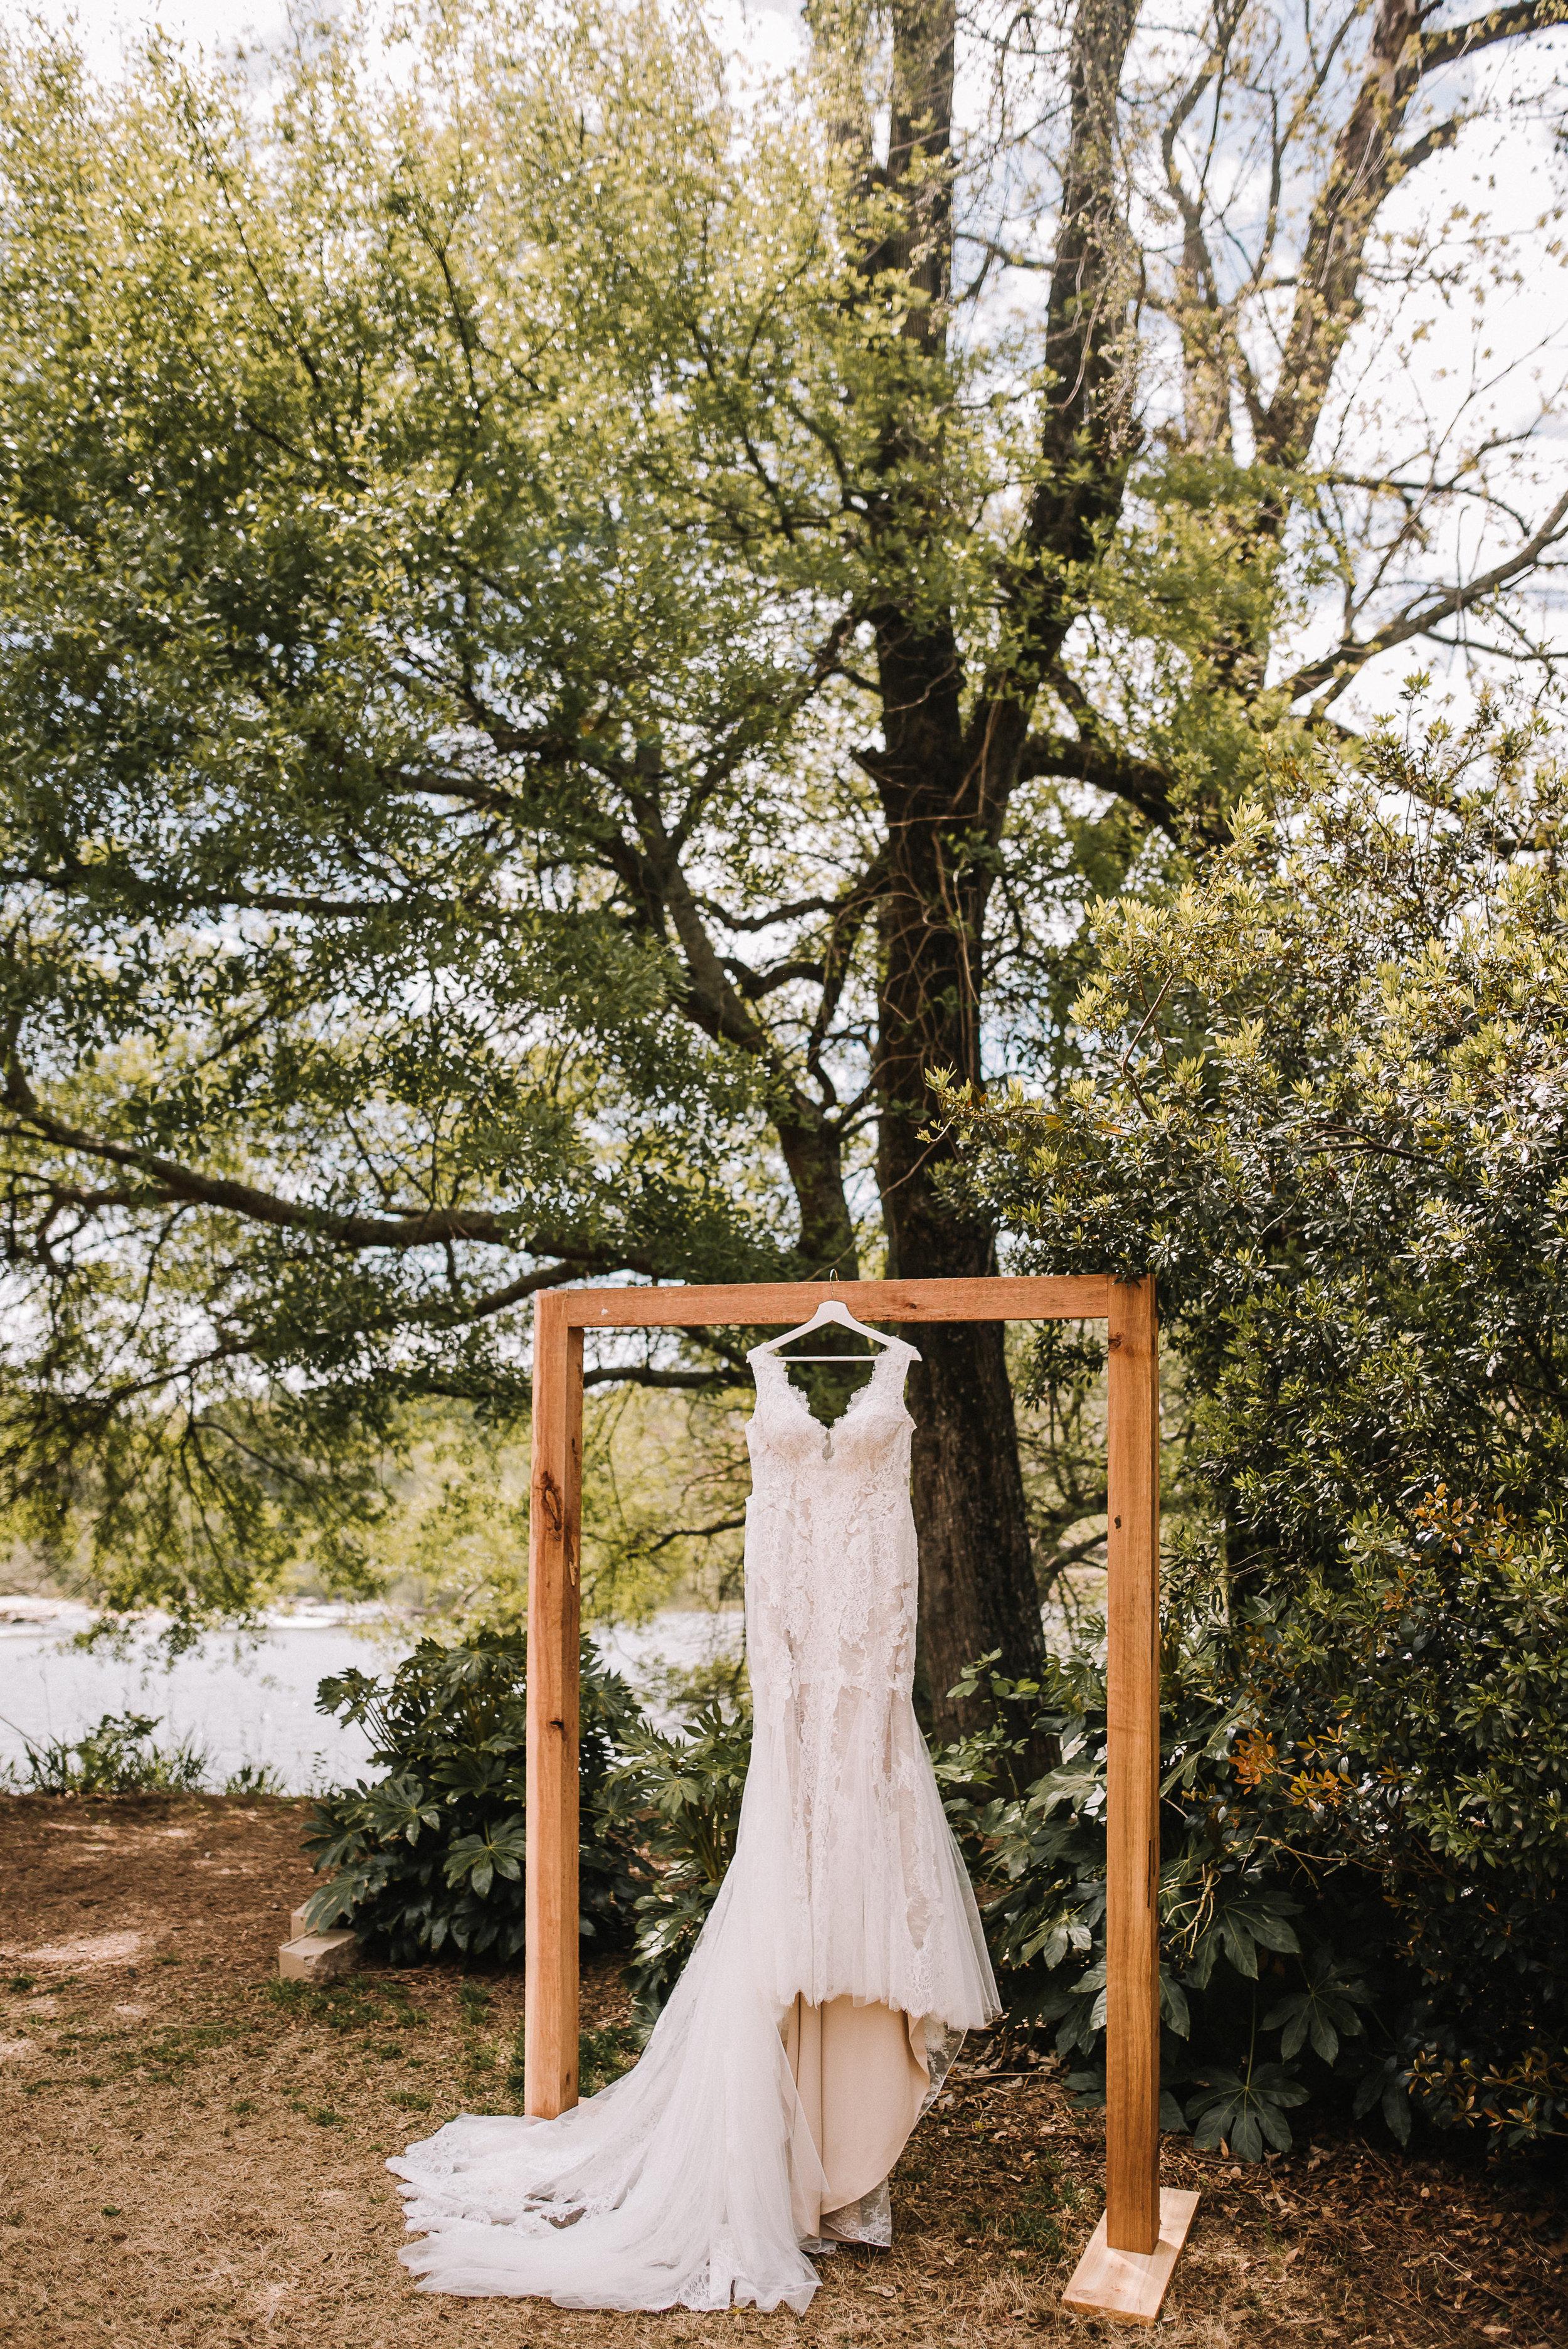 Morgan Wedding_Mill at Yellow River_Ashley Benham Photography-30.jpg